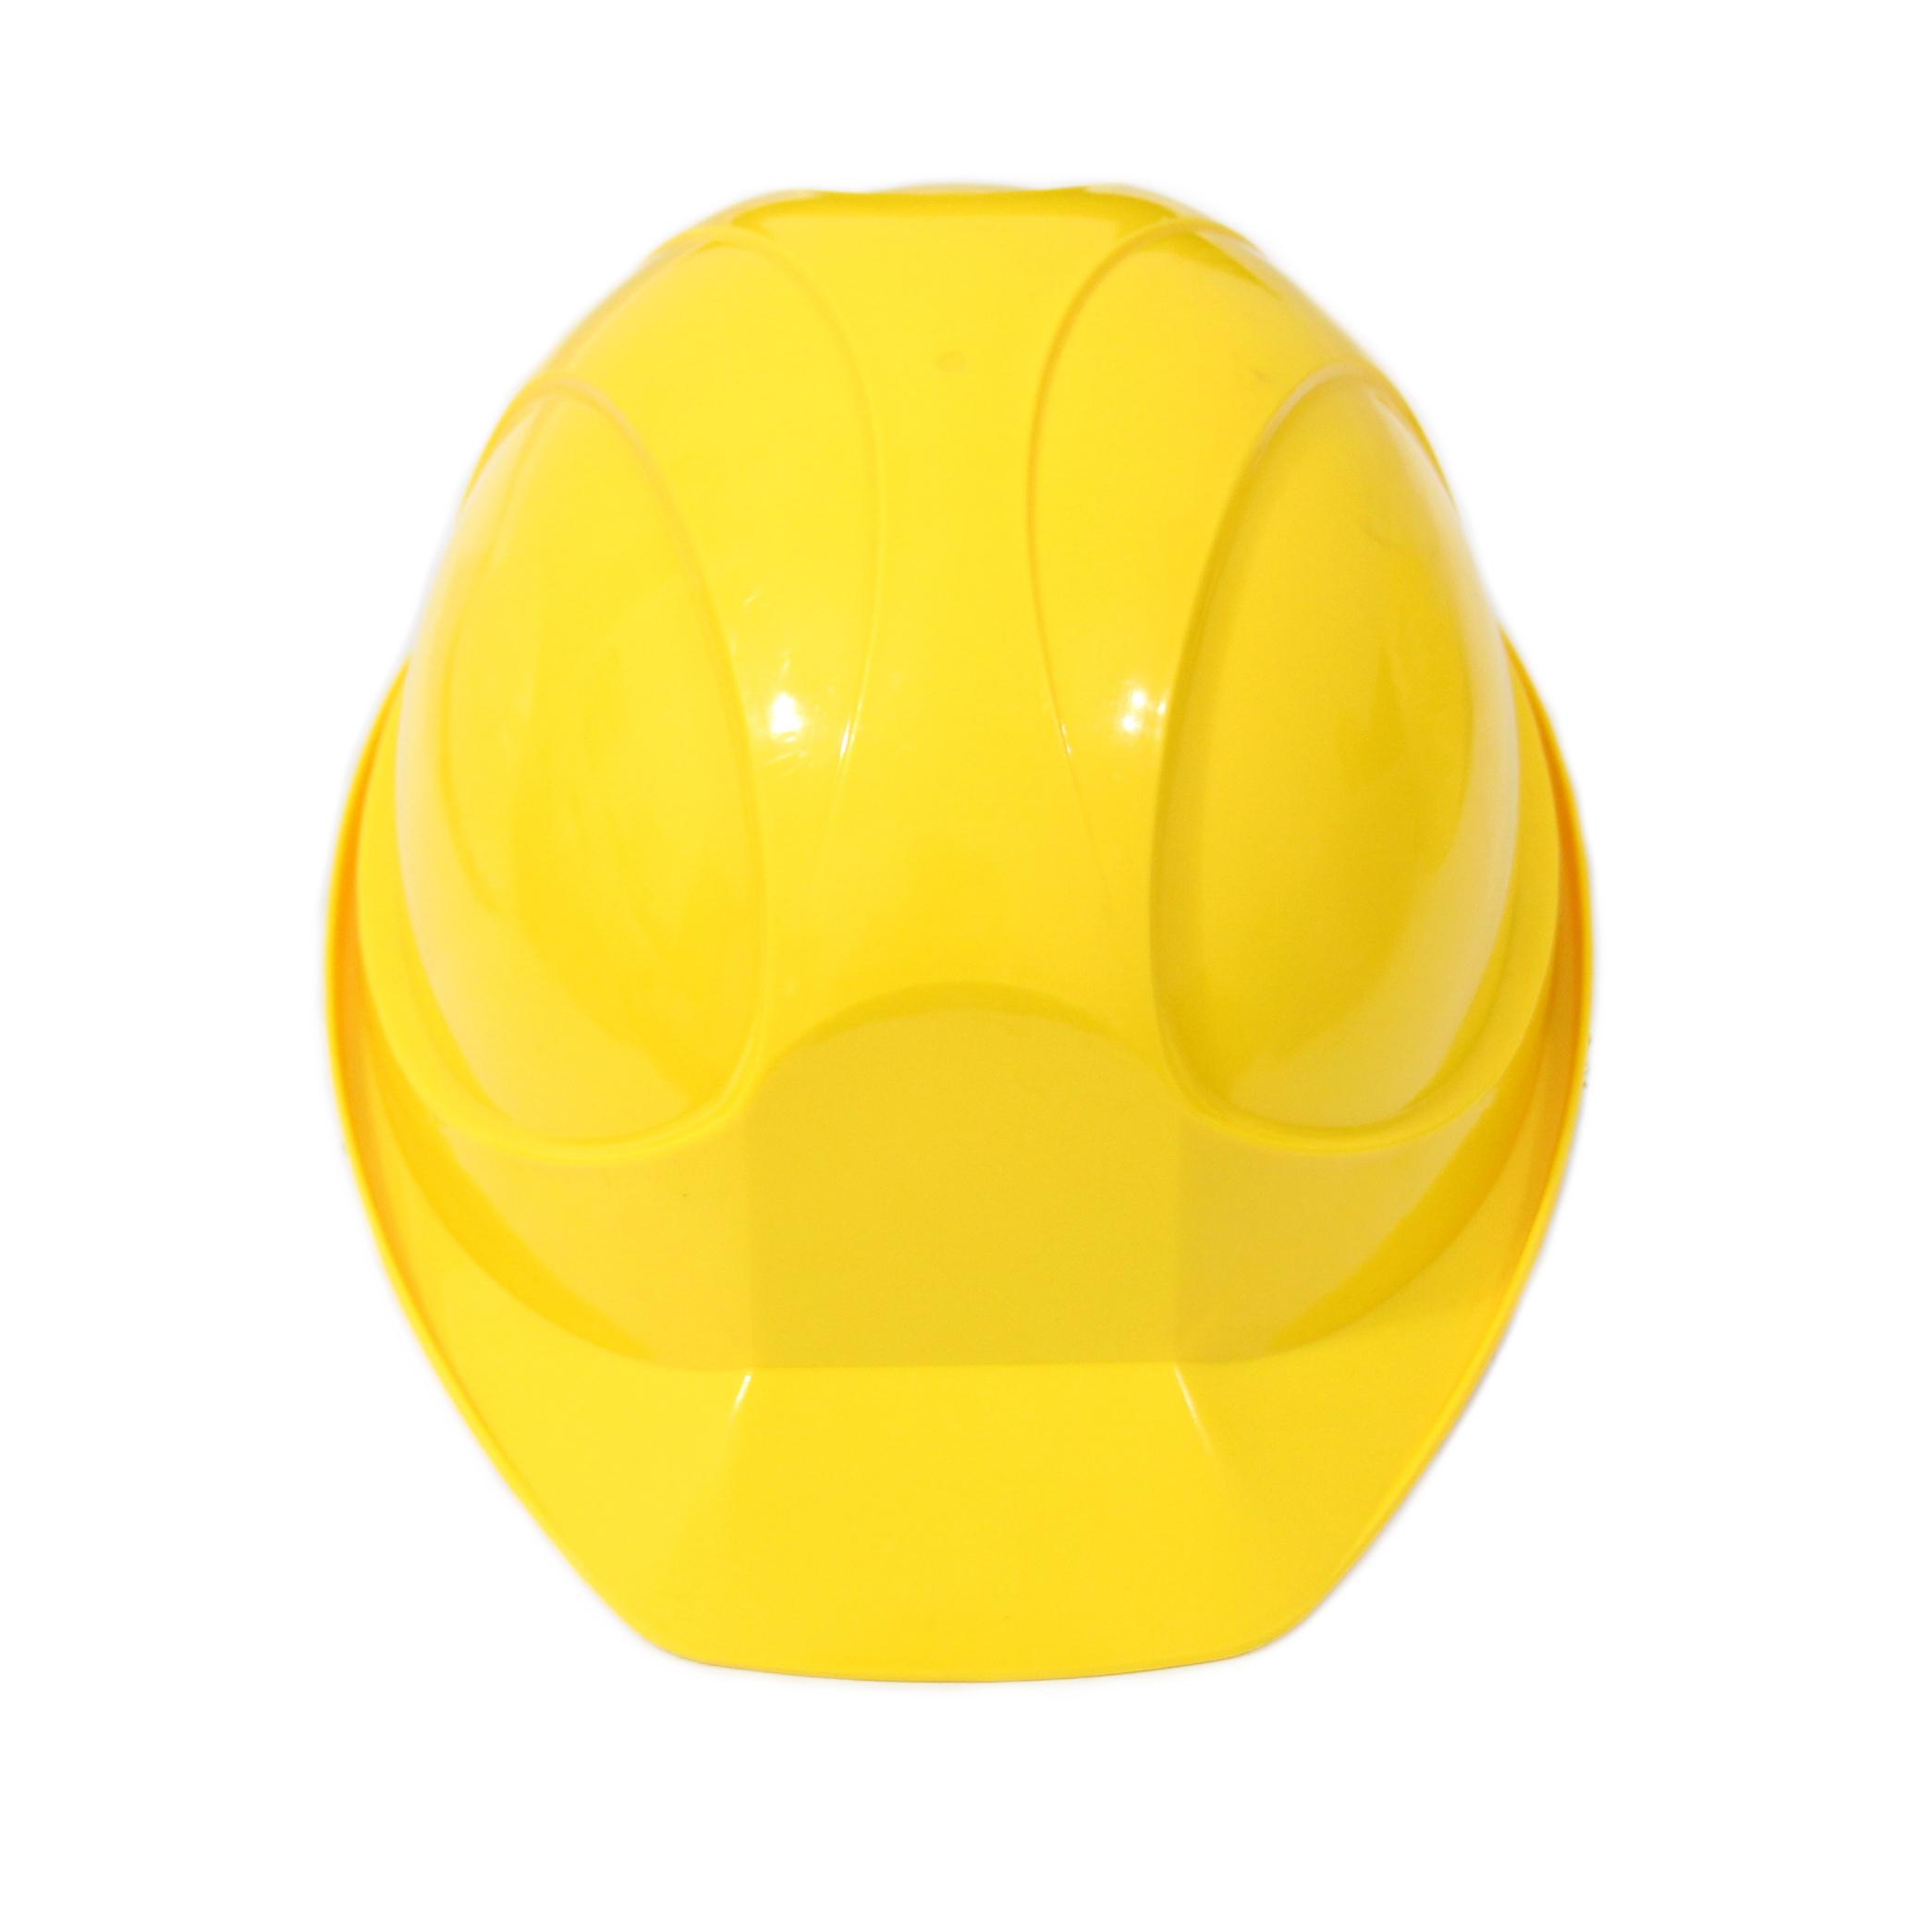 Каска AmparoКаски, шлемы<br>Материал: пластик,<br>Цвет: желтая,<br>Вес нетто: 0.46<br>